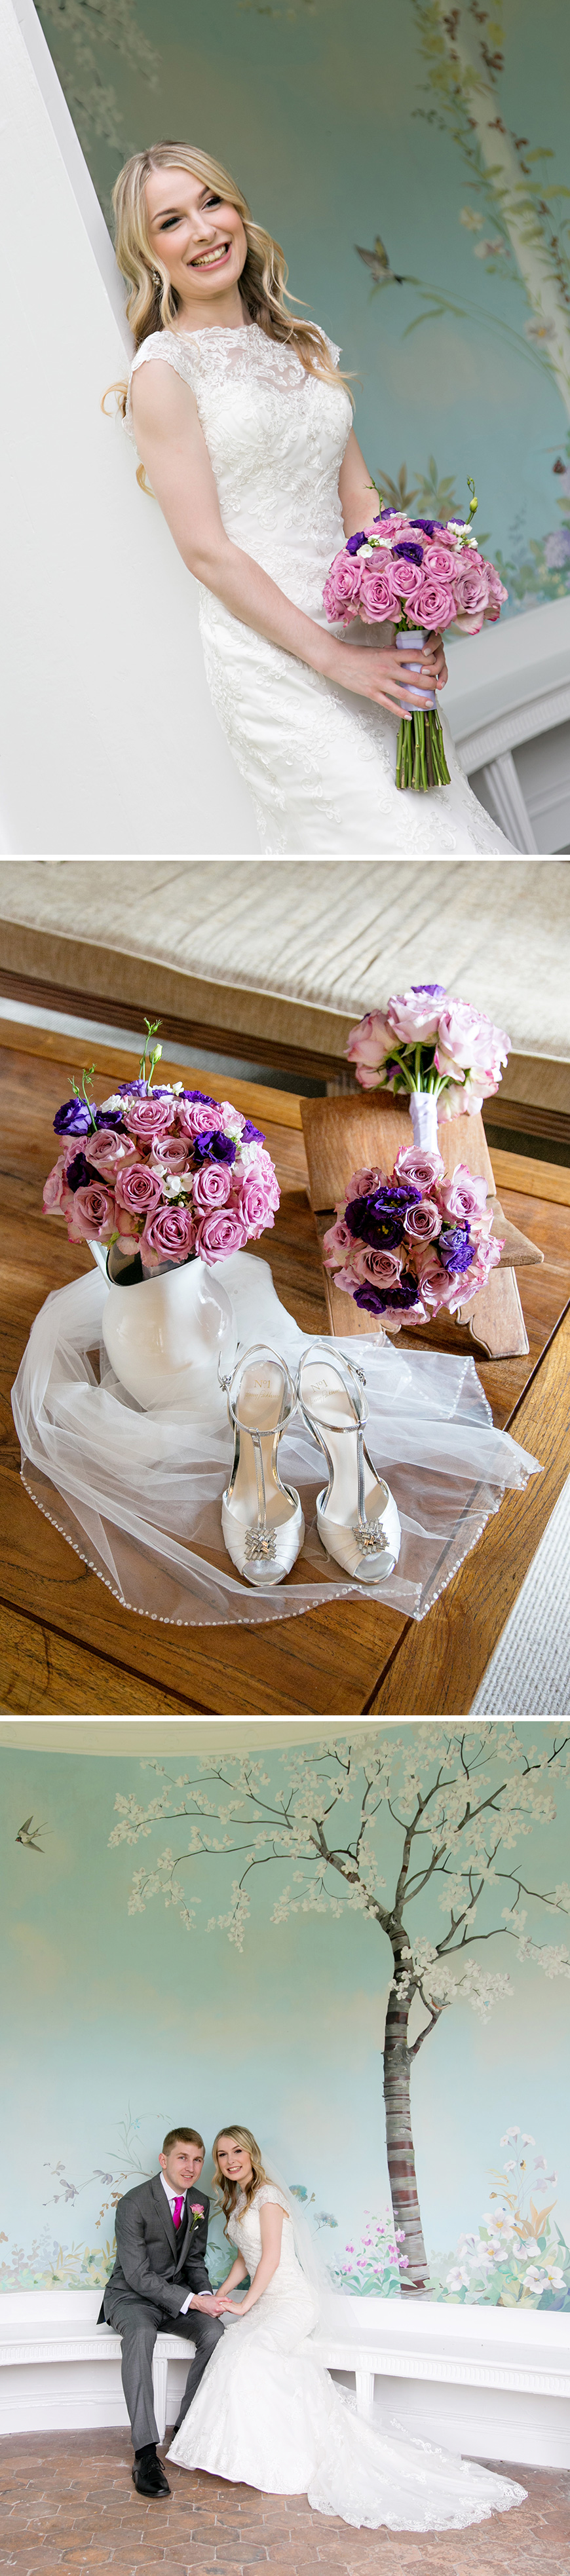 Real Wedding - Stephanie and James's Elegant Summer Wedding at Wasing Park   CHWV